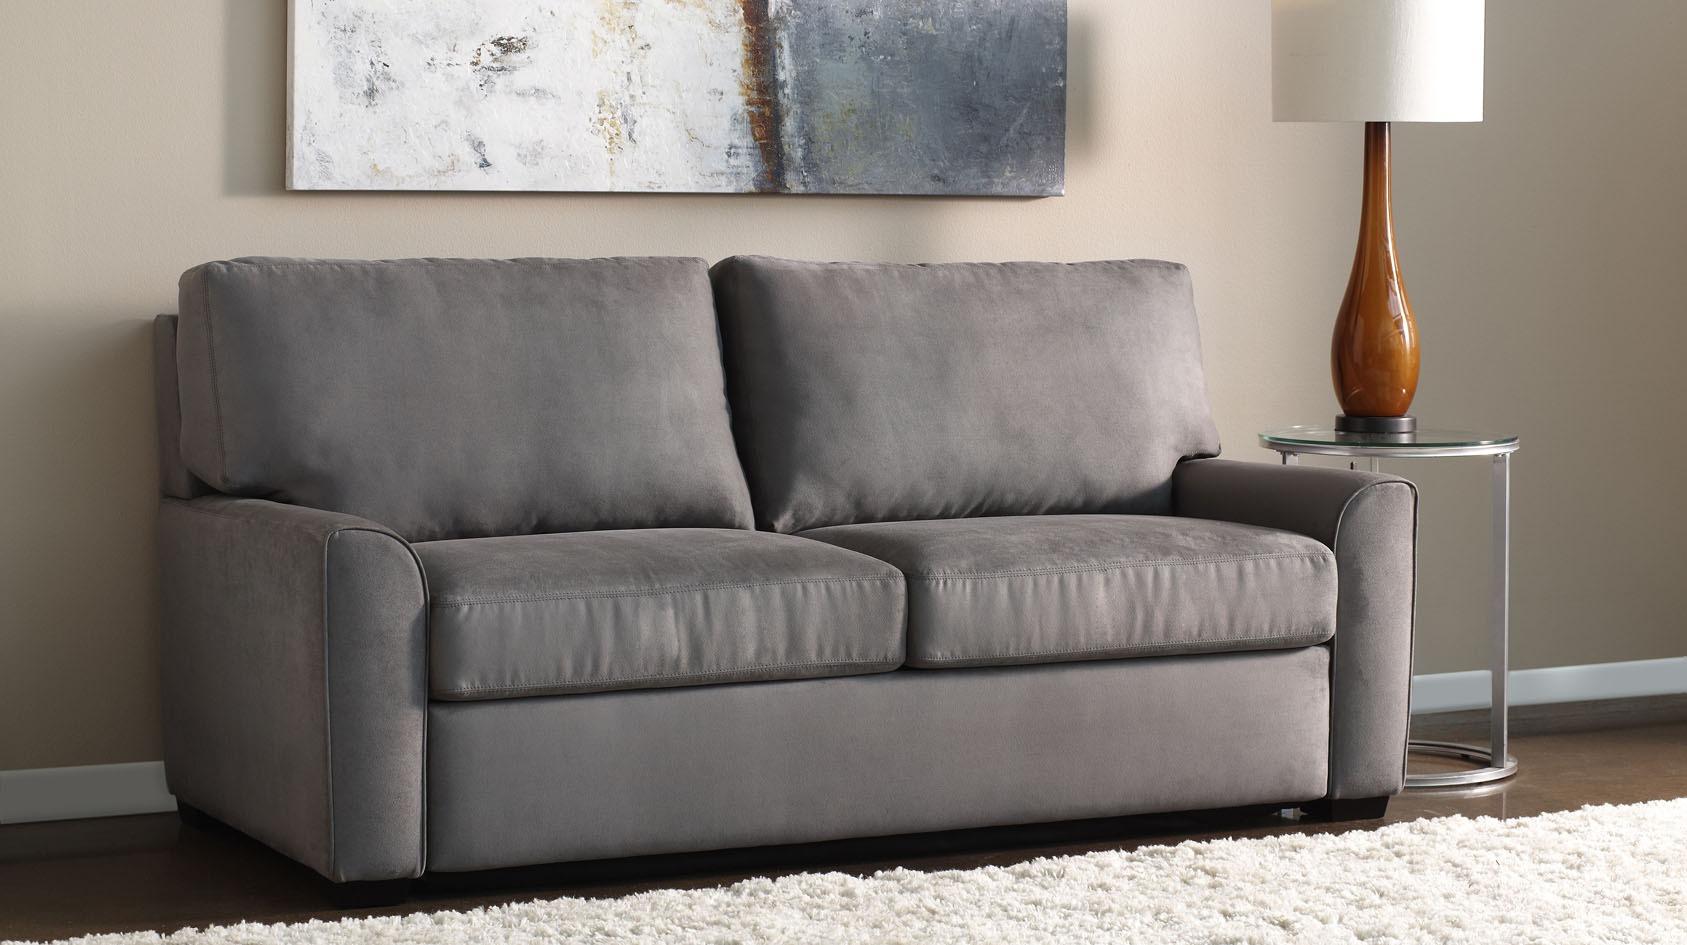 American leather luxe sofa american leather adalyn comfort sleeper